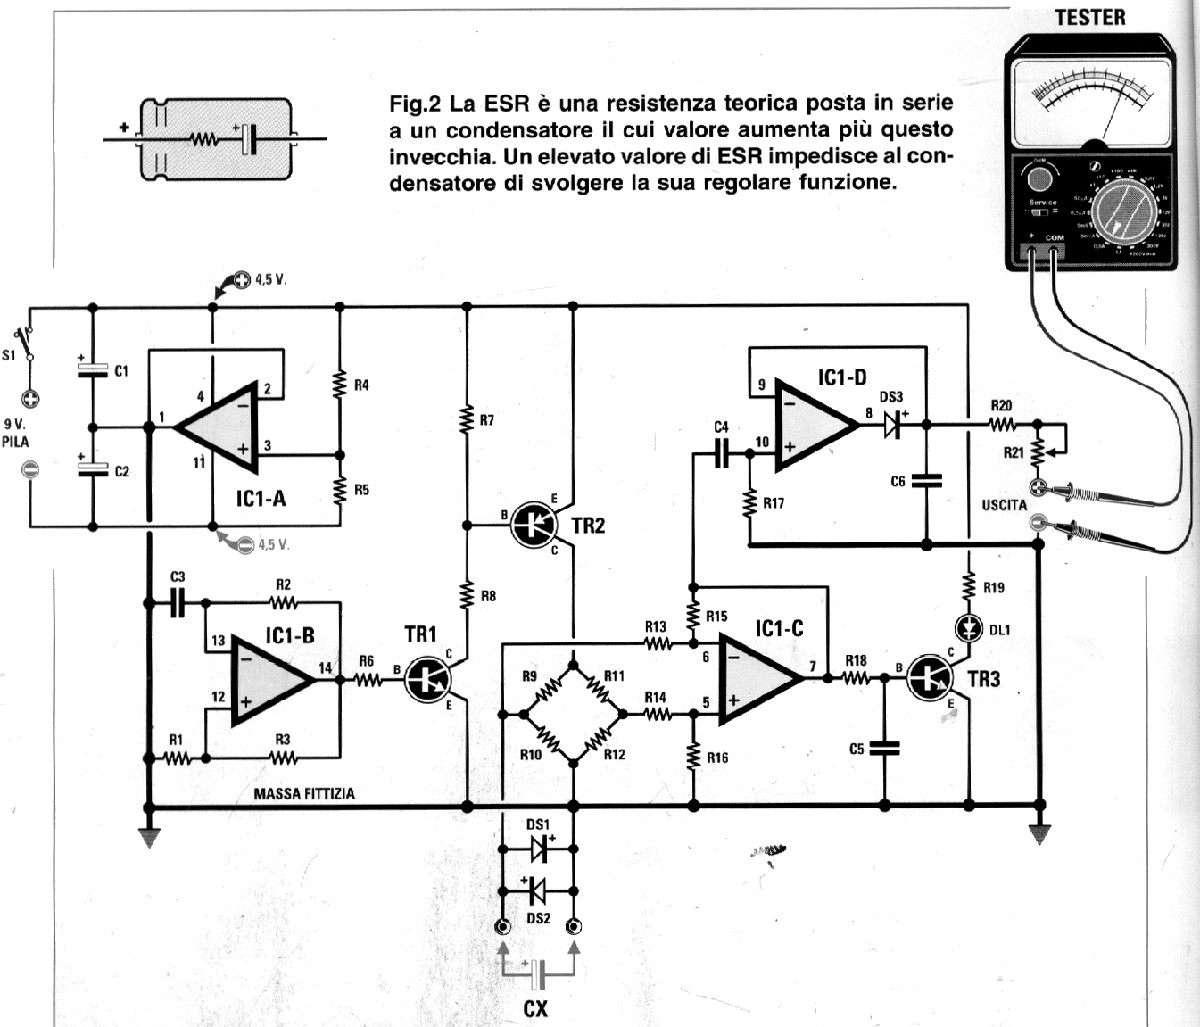 github 4x1md analog esr meter analog esr meter rh github com elektor esr meter schematic esr tester schematic diagram